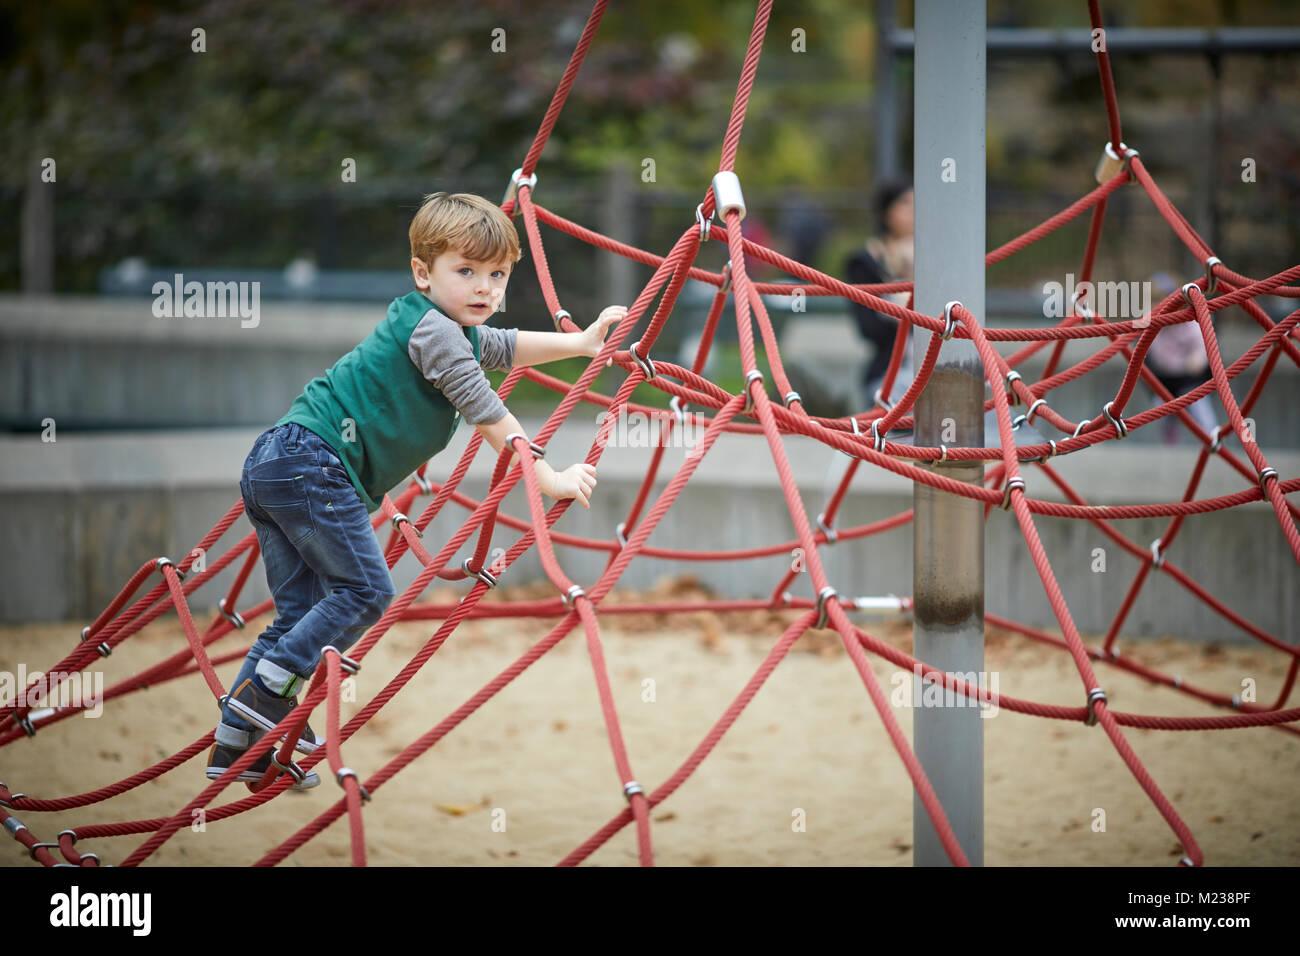 Klettergerüst Dreieck : New york city manhattan central park junge auf seil dreieck